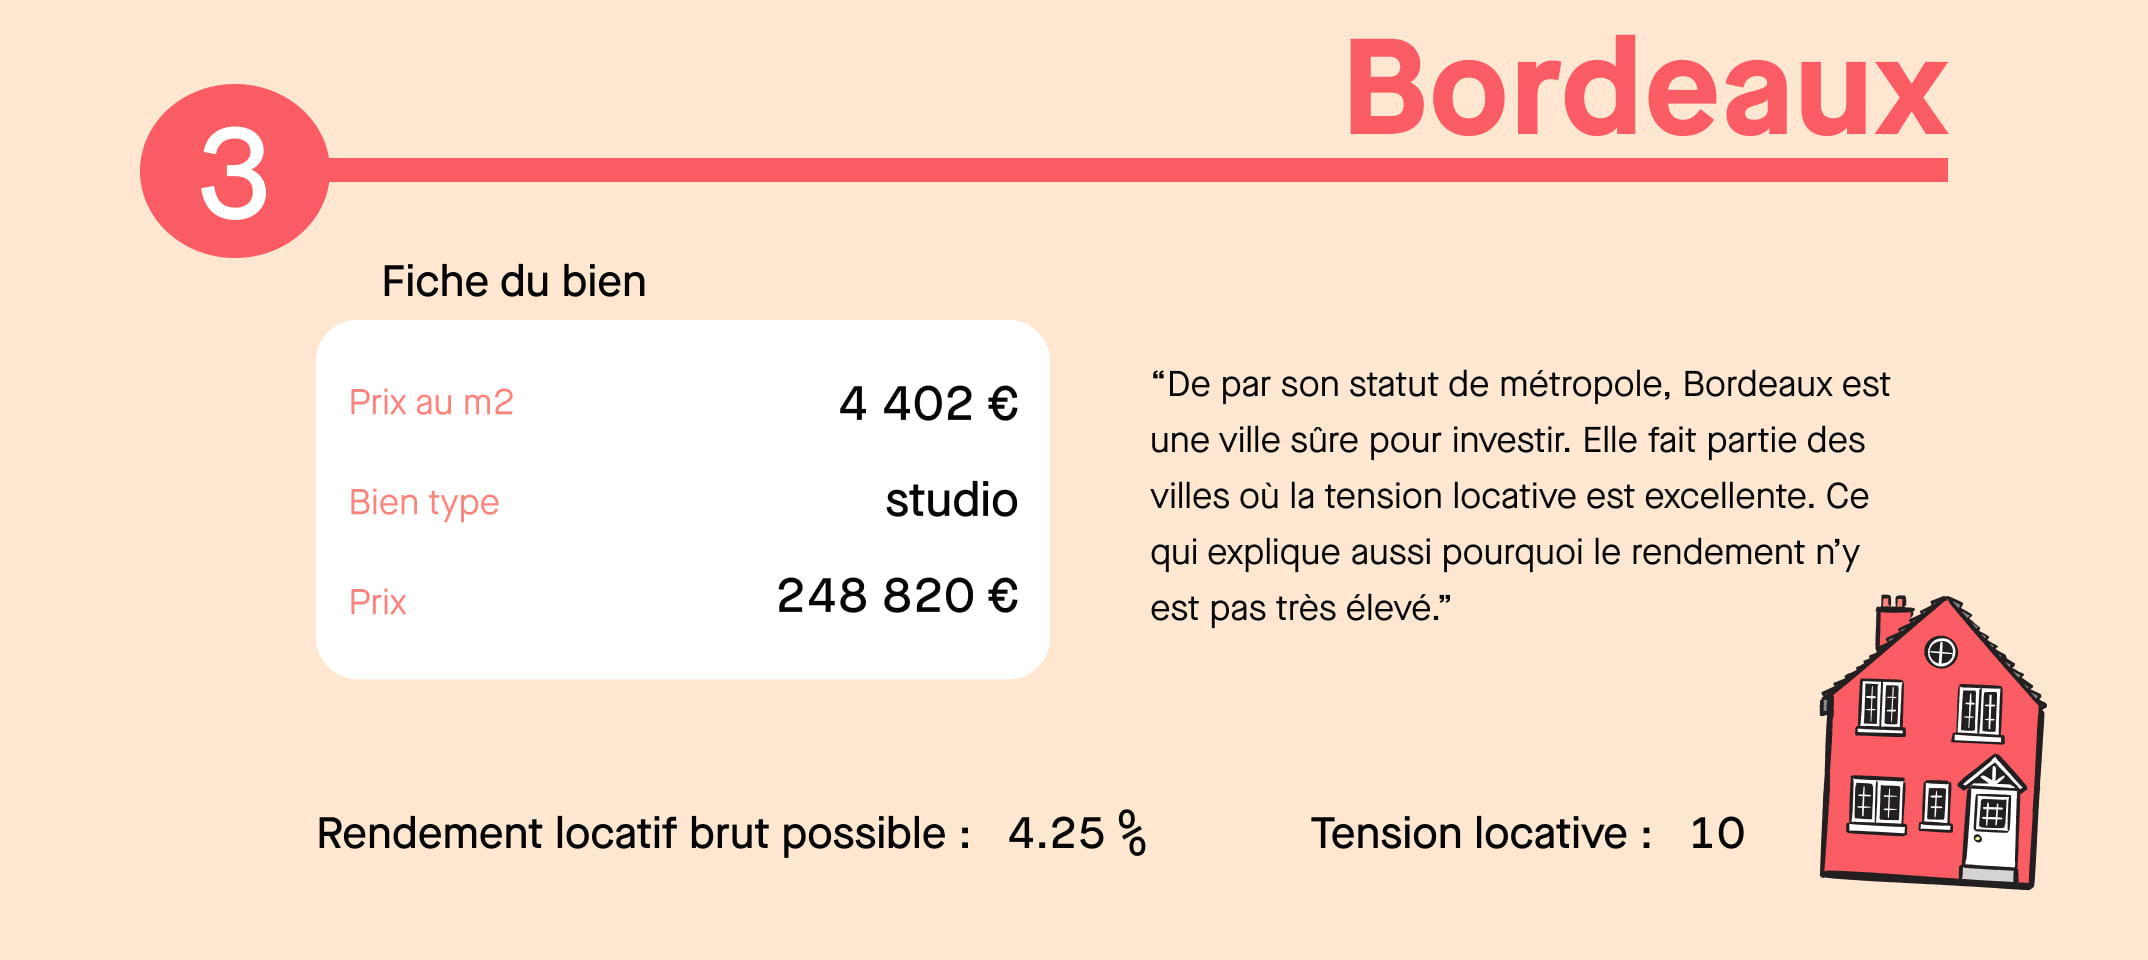 Infographie investissement locatif Bordeaux